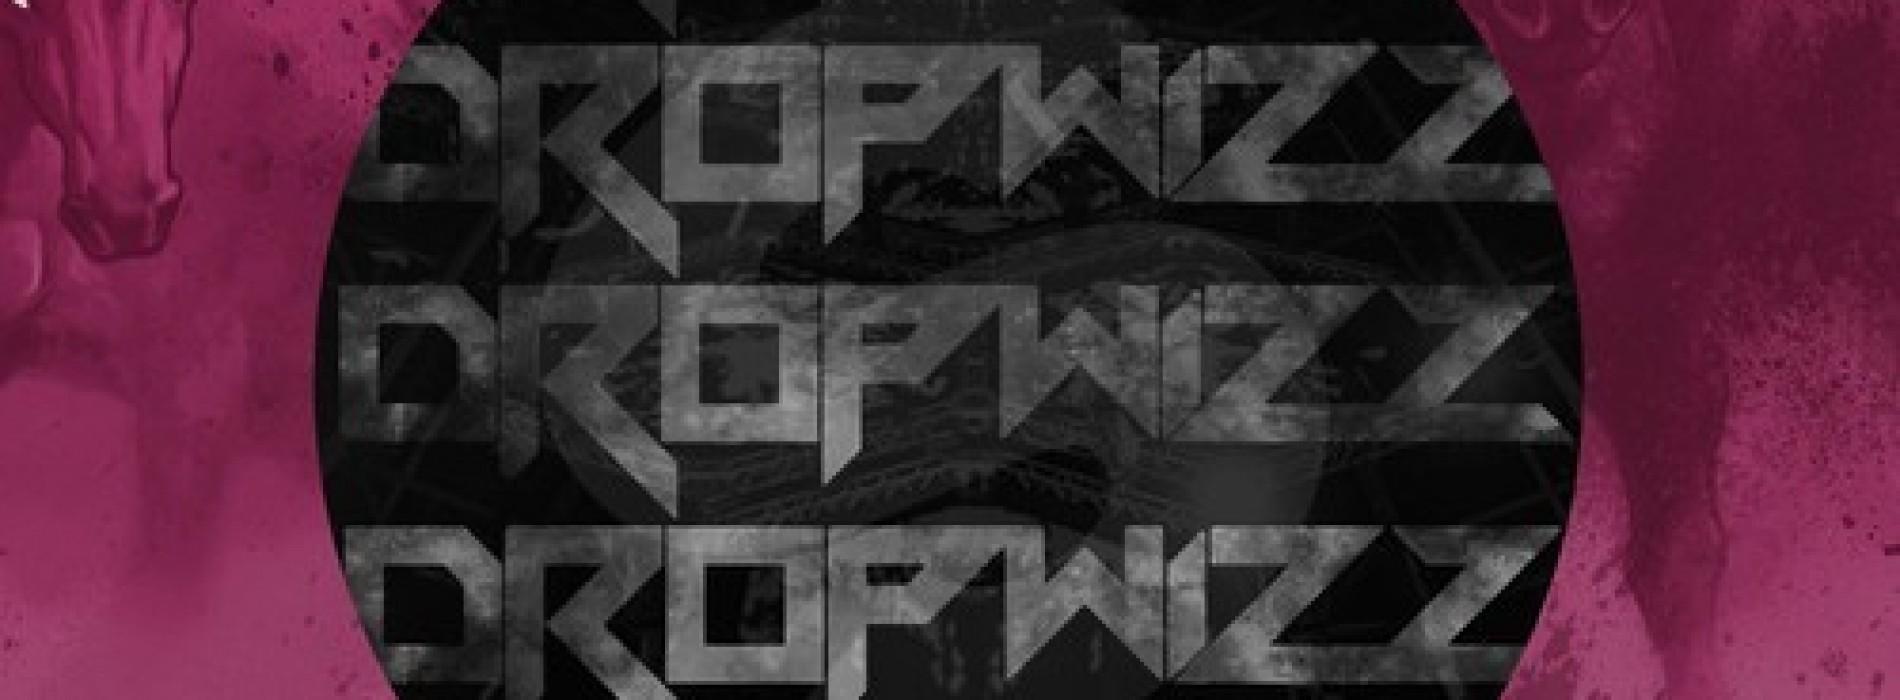 Borgore & Sikdope – Unicorn Zombie Apocalypse (Dropwizz Trapleg)